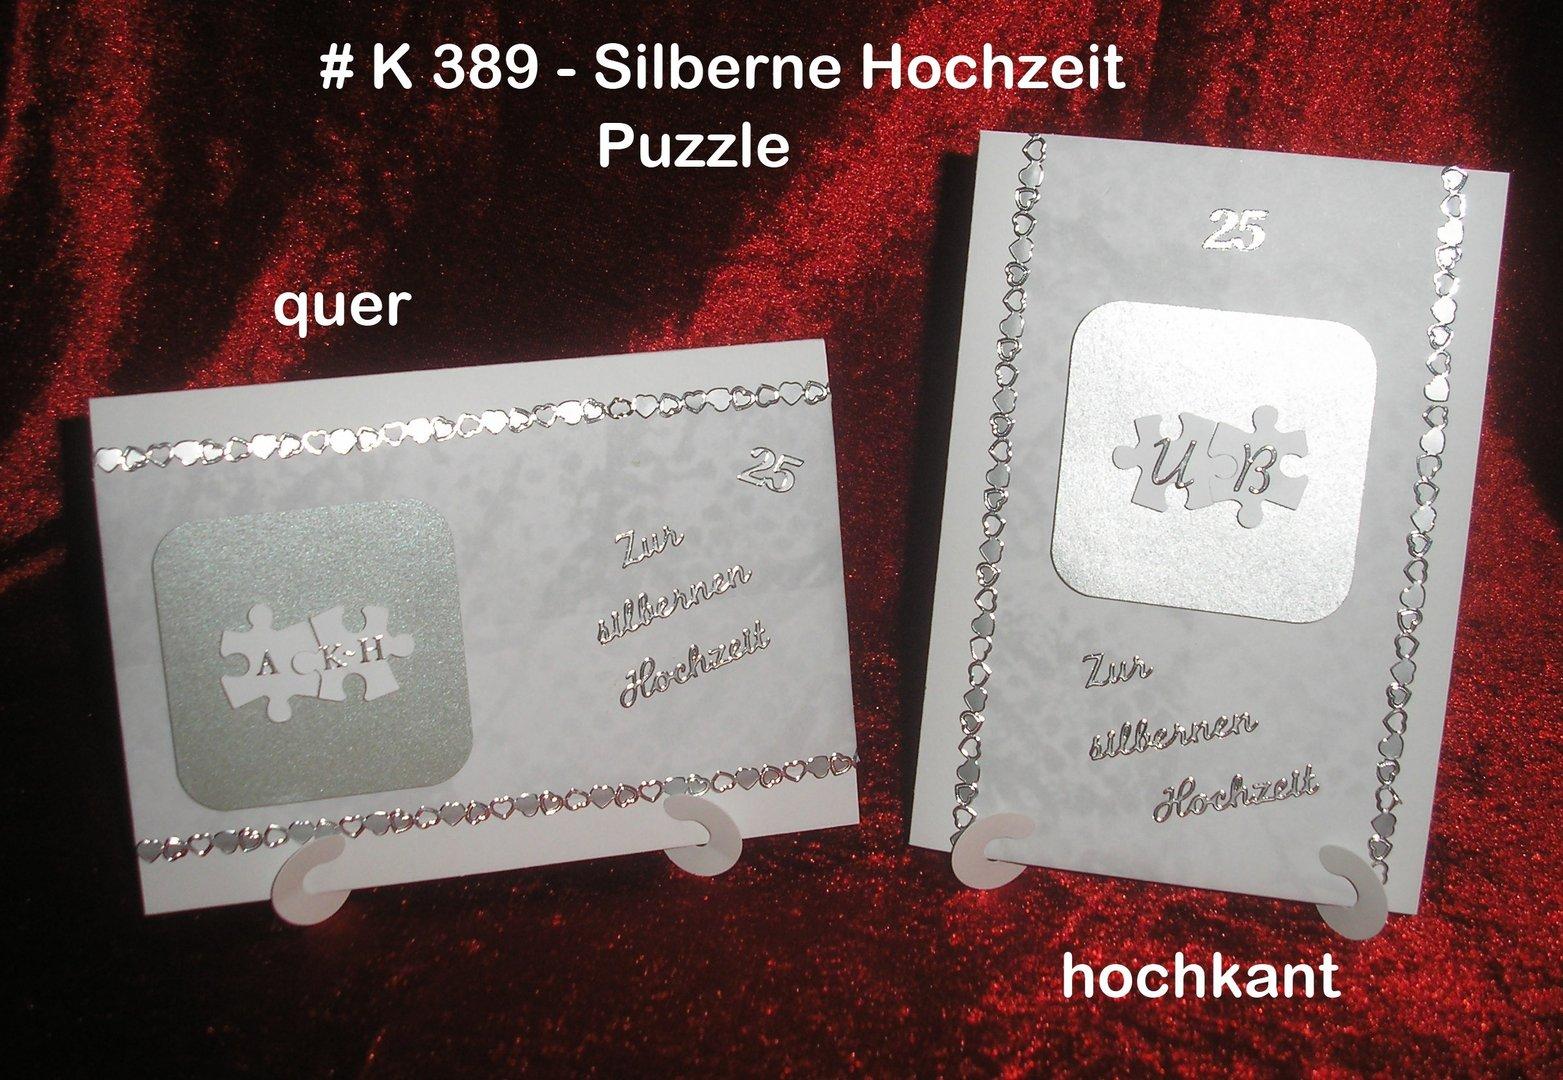 Karte Silberhochzeit Text.Karte Silberhochzeit Puzzle